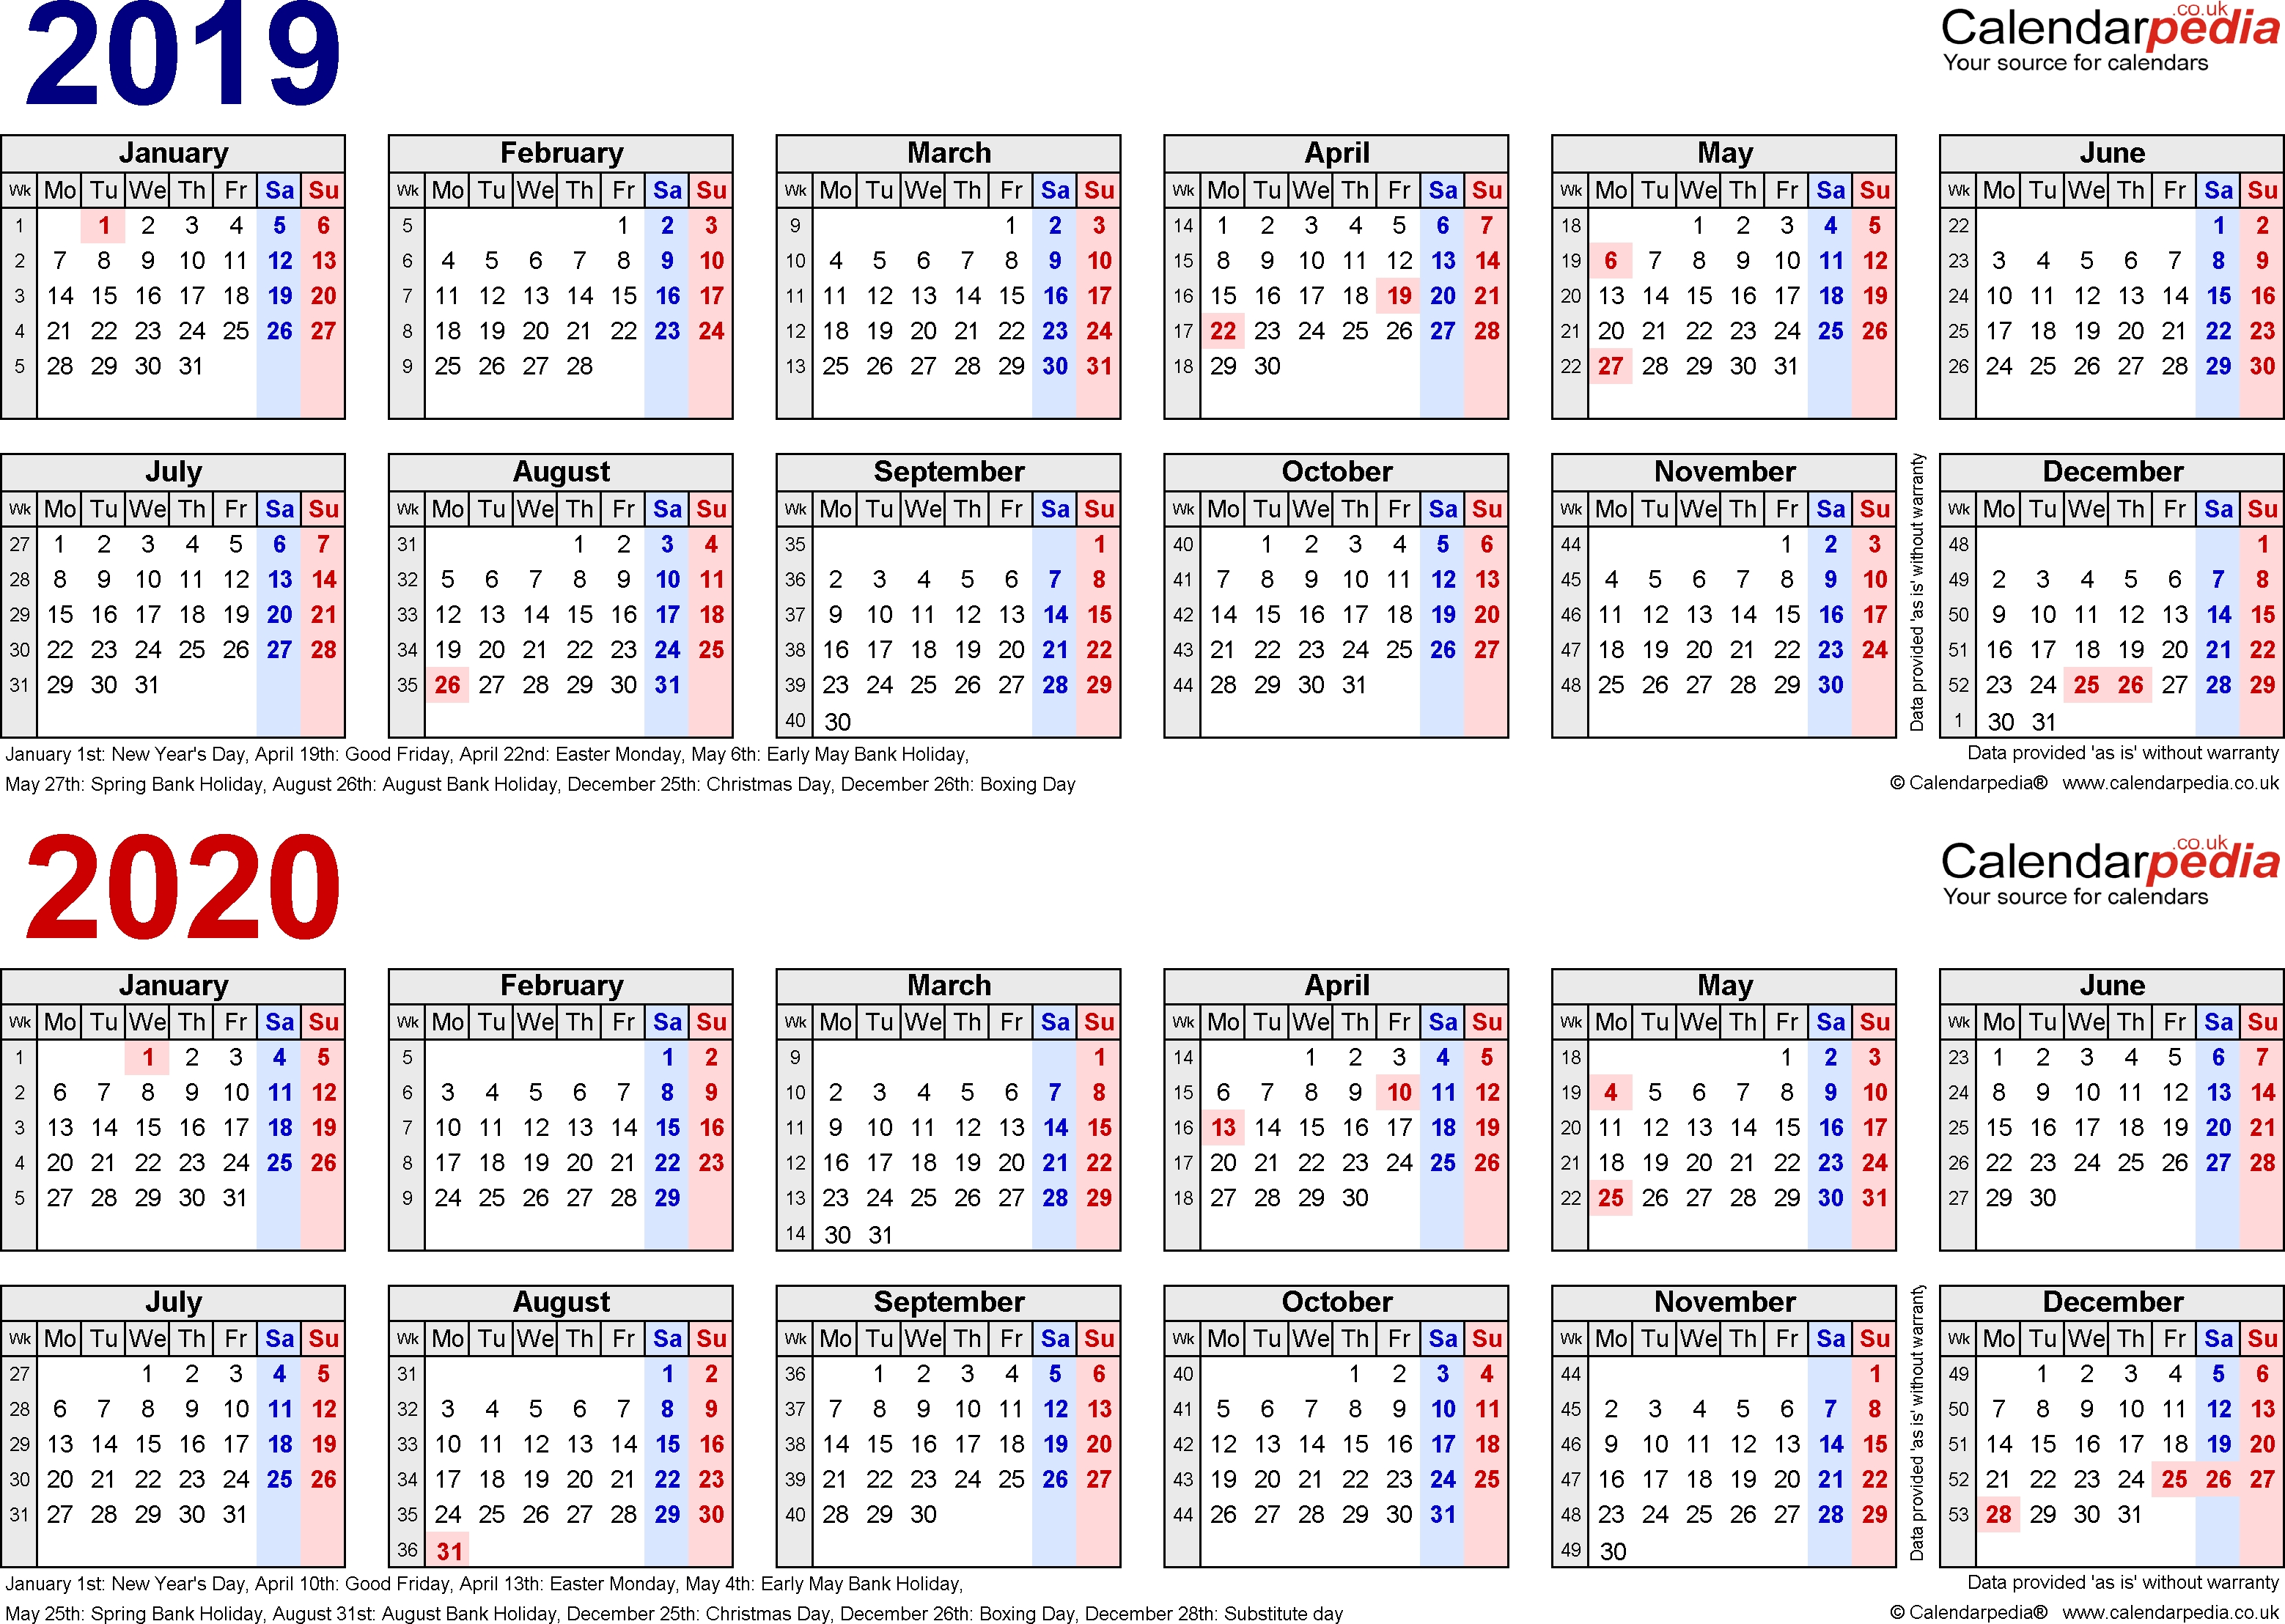 Two Year Calendars For 2019 & 2020 (Uk) For Pdf 2019 Calendar 2020 Printable